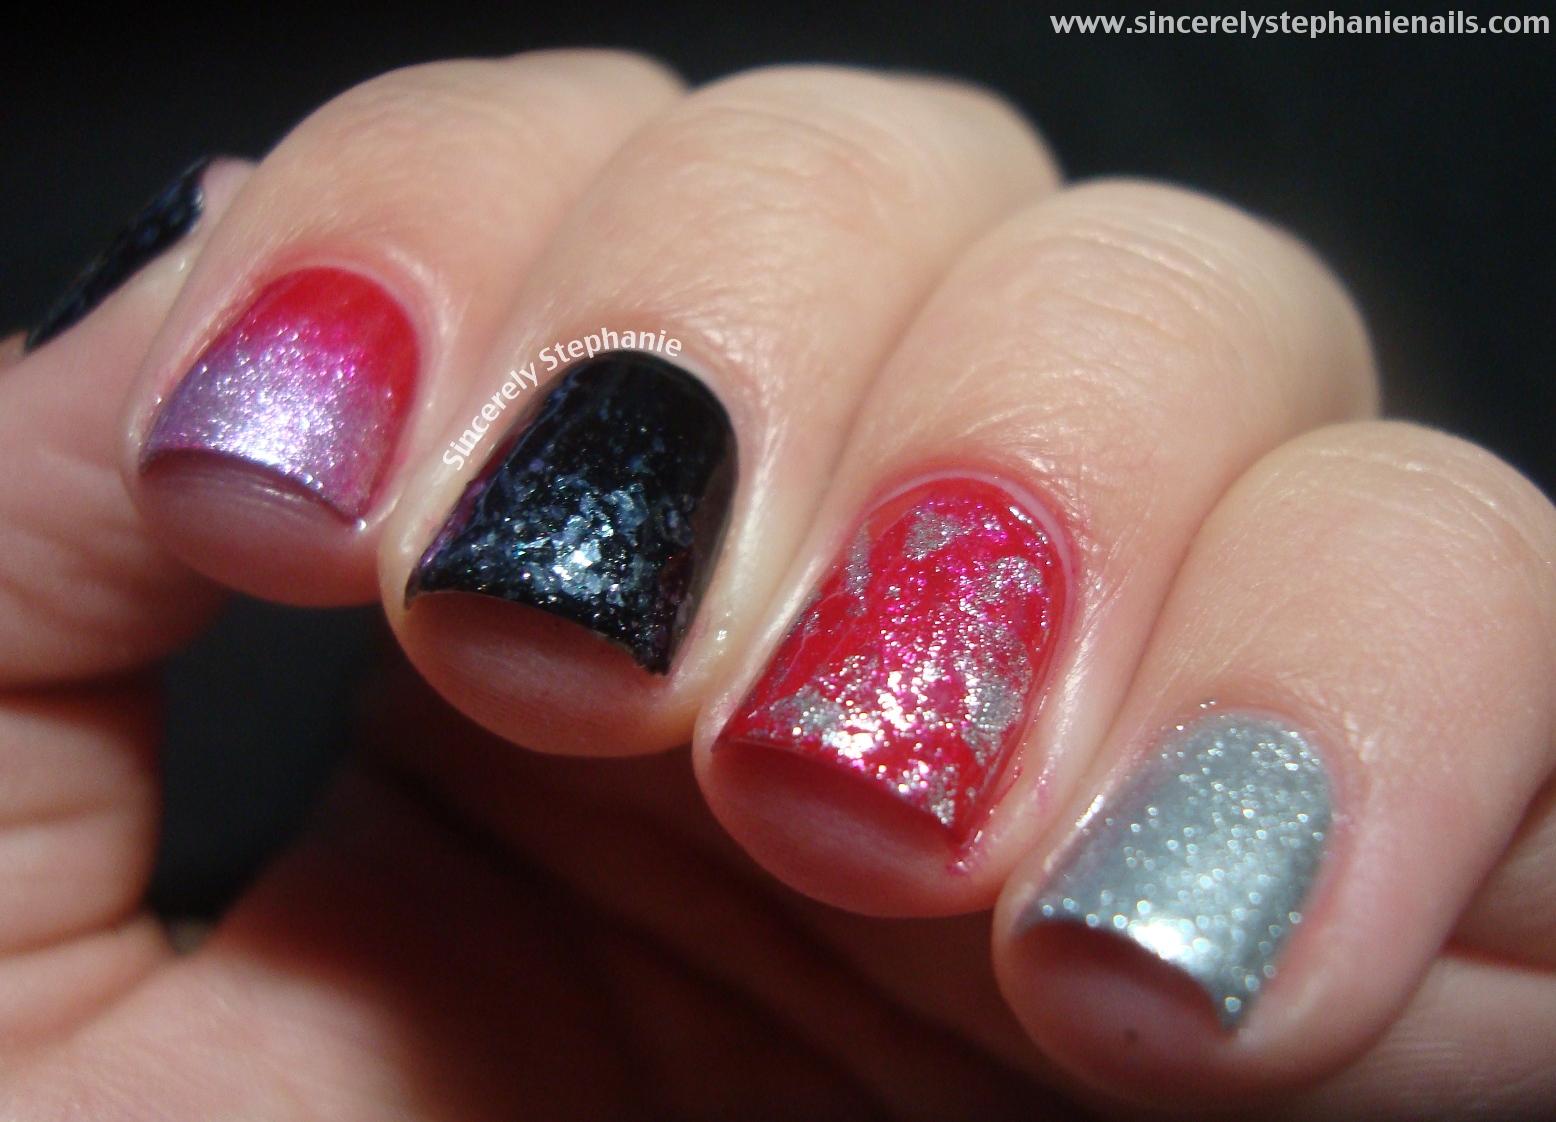 Walmart nail salon manicures autos weblog for Acrylic nails walmart salon